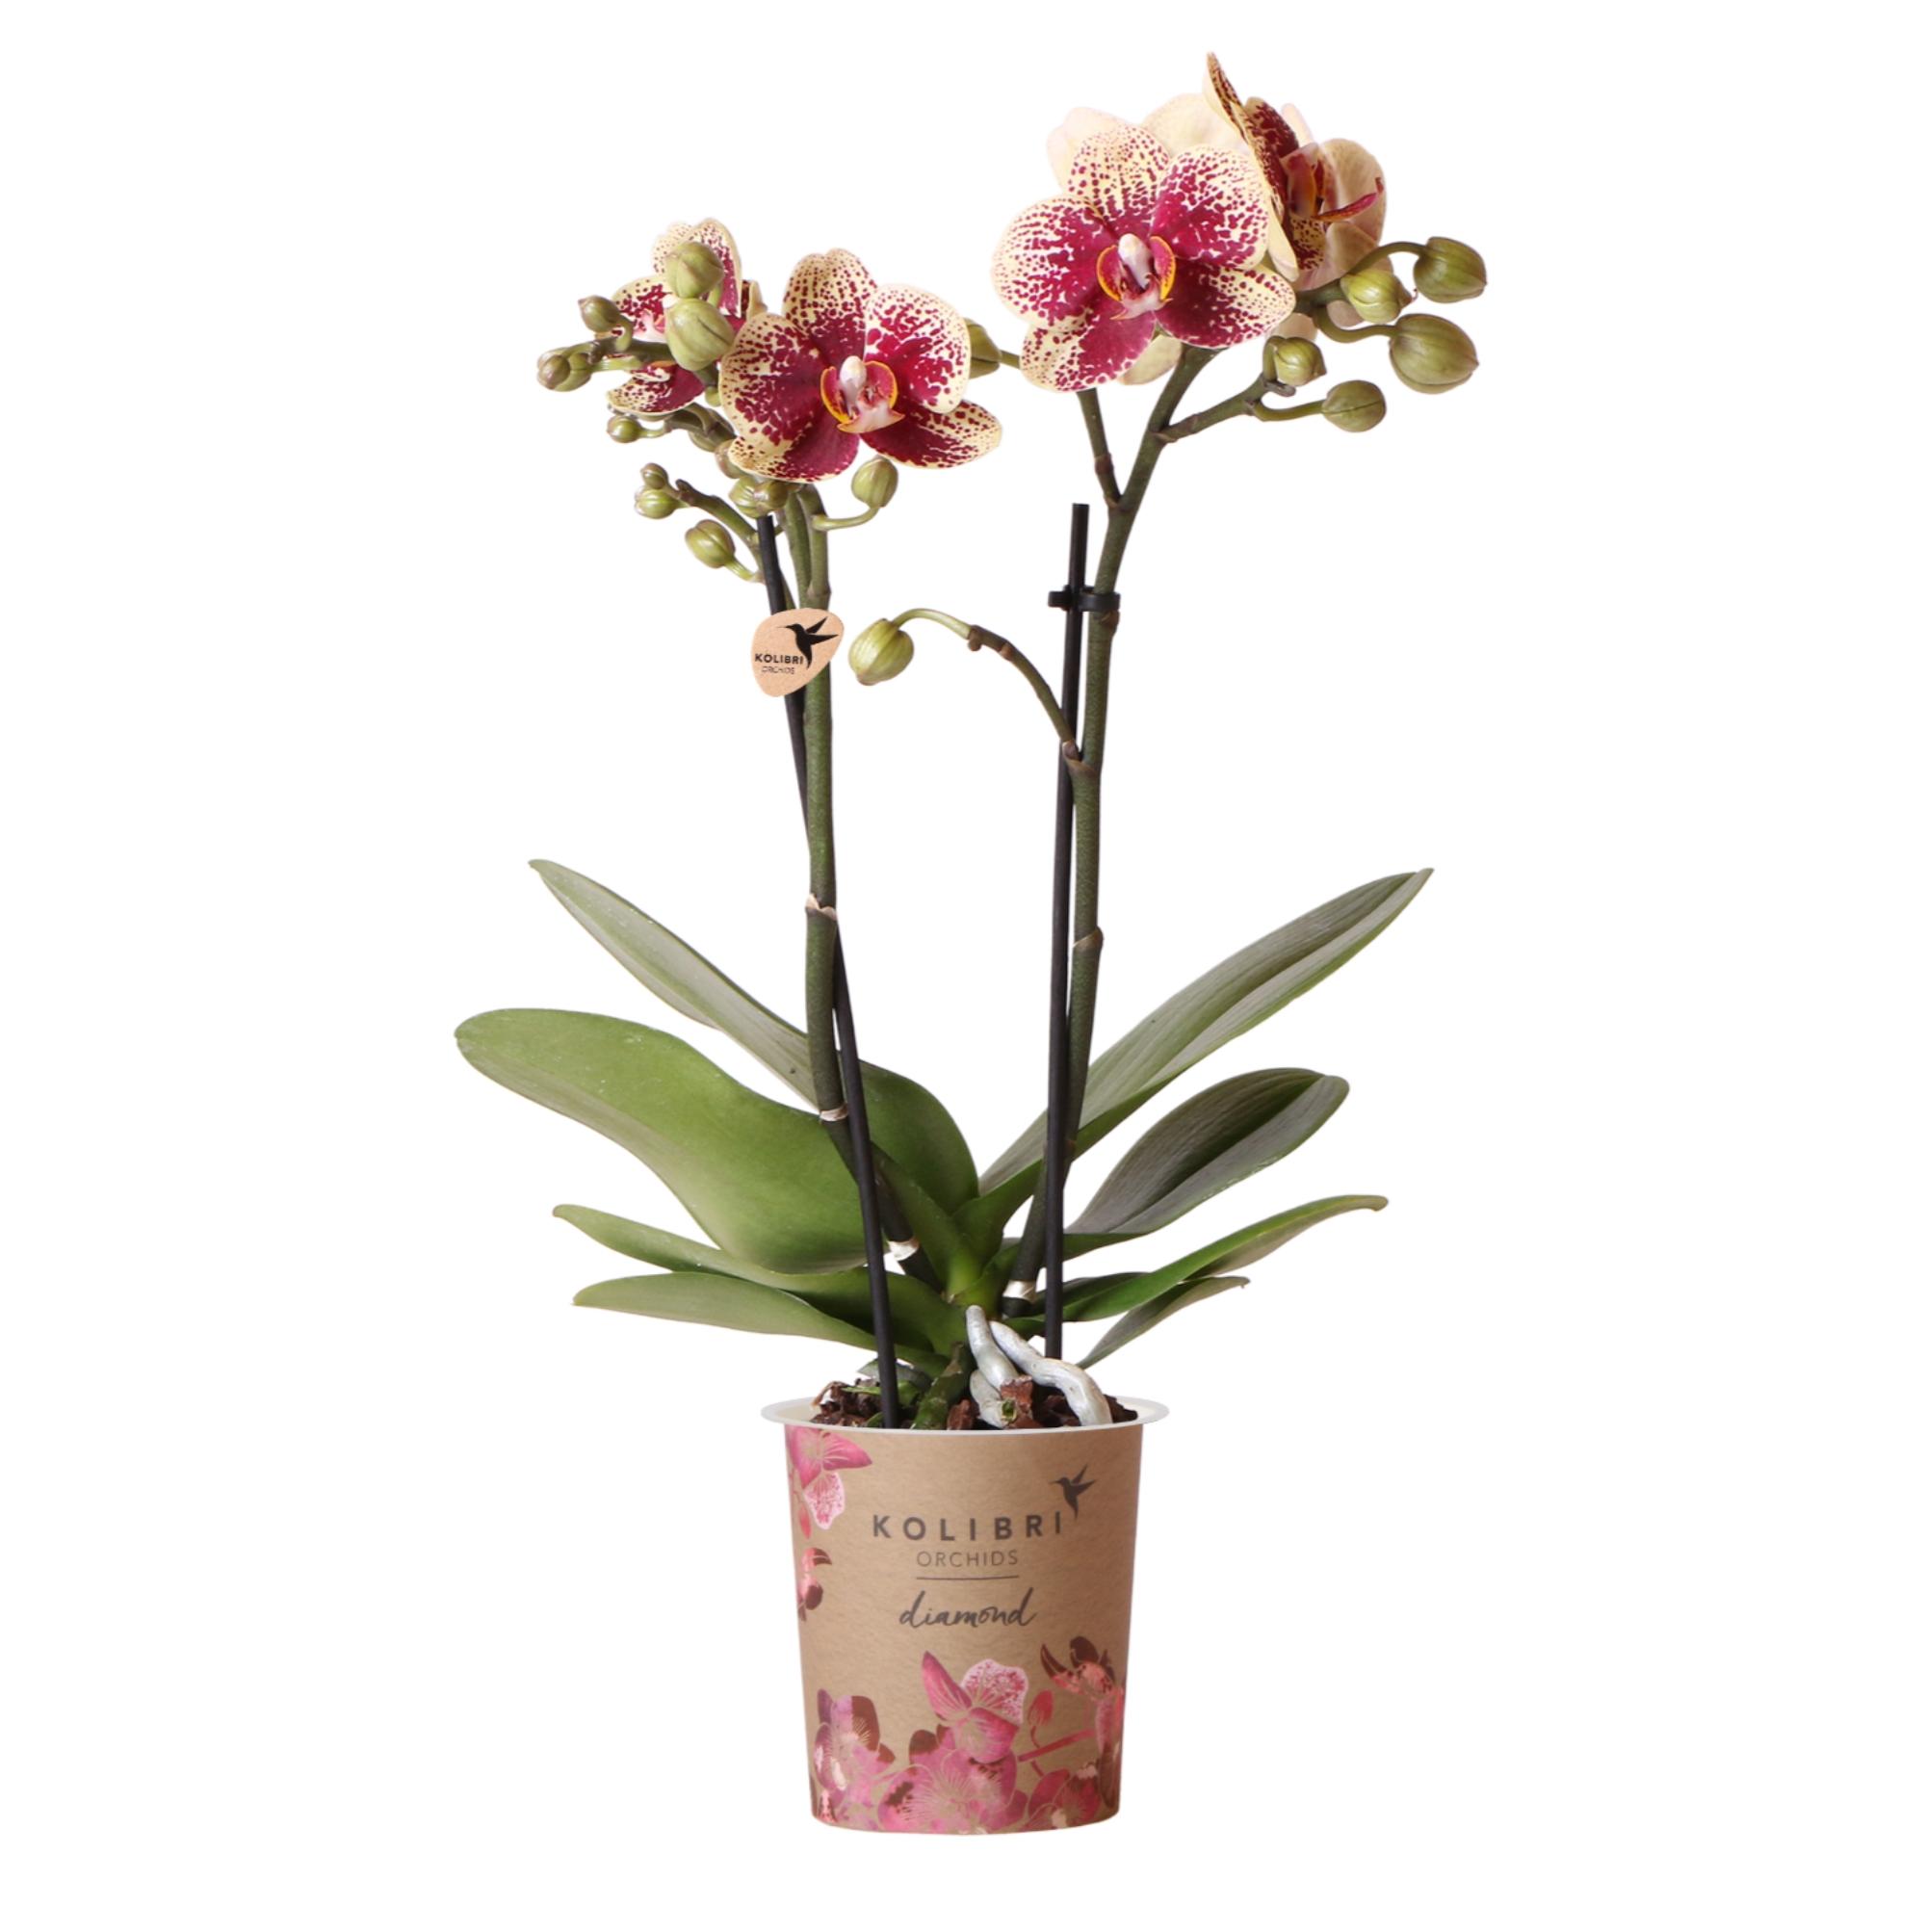 Kolibri Company - Kolibri Orchids Diamond red Spain 9cm orchidee kopen